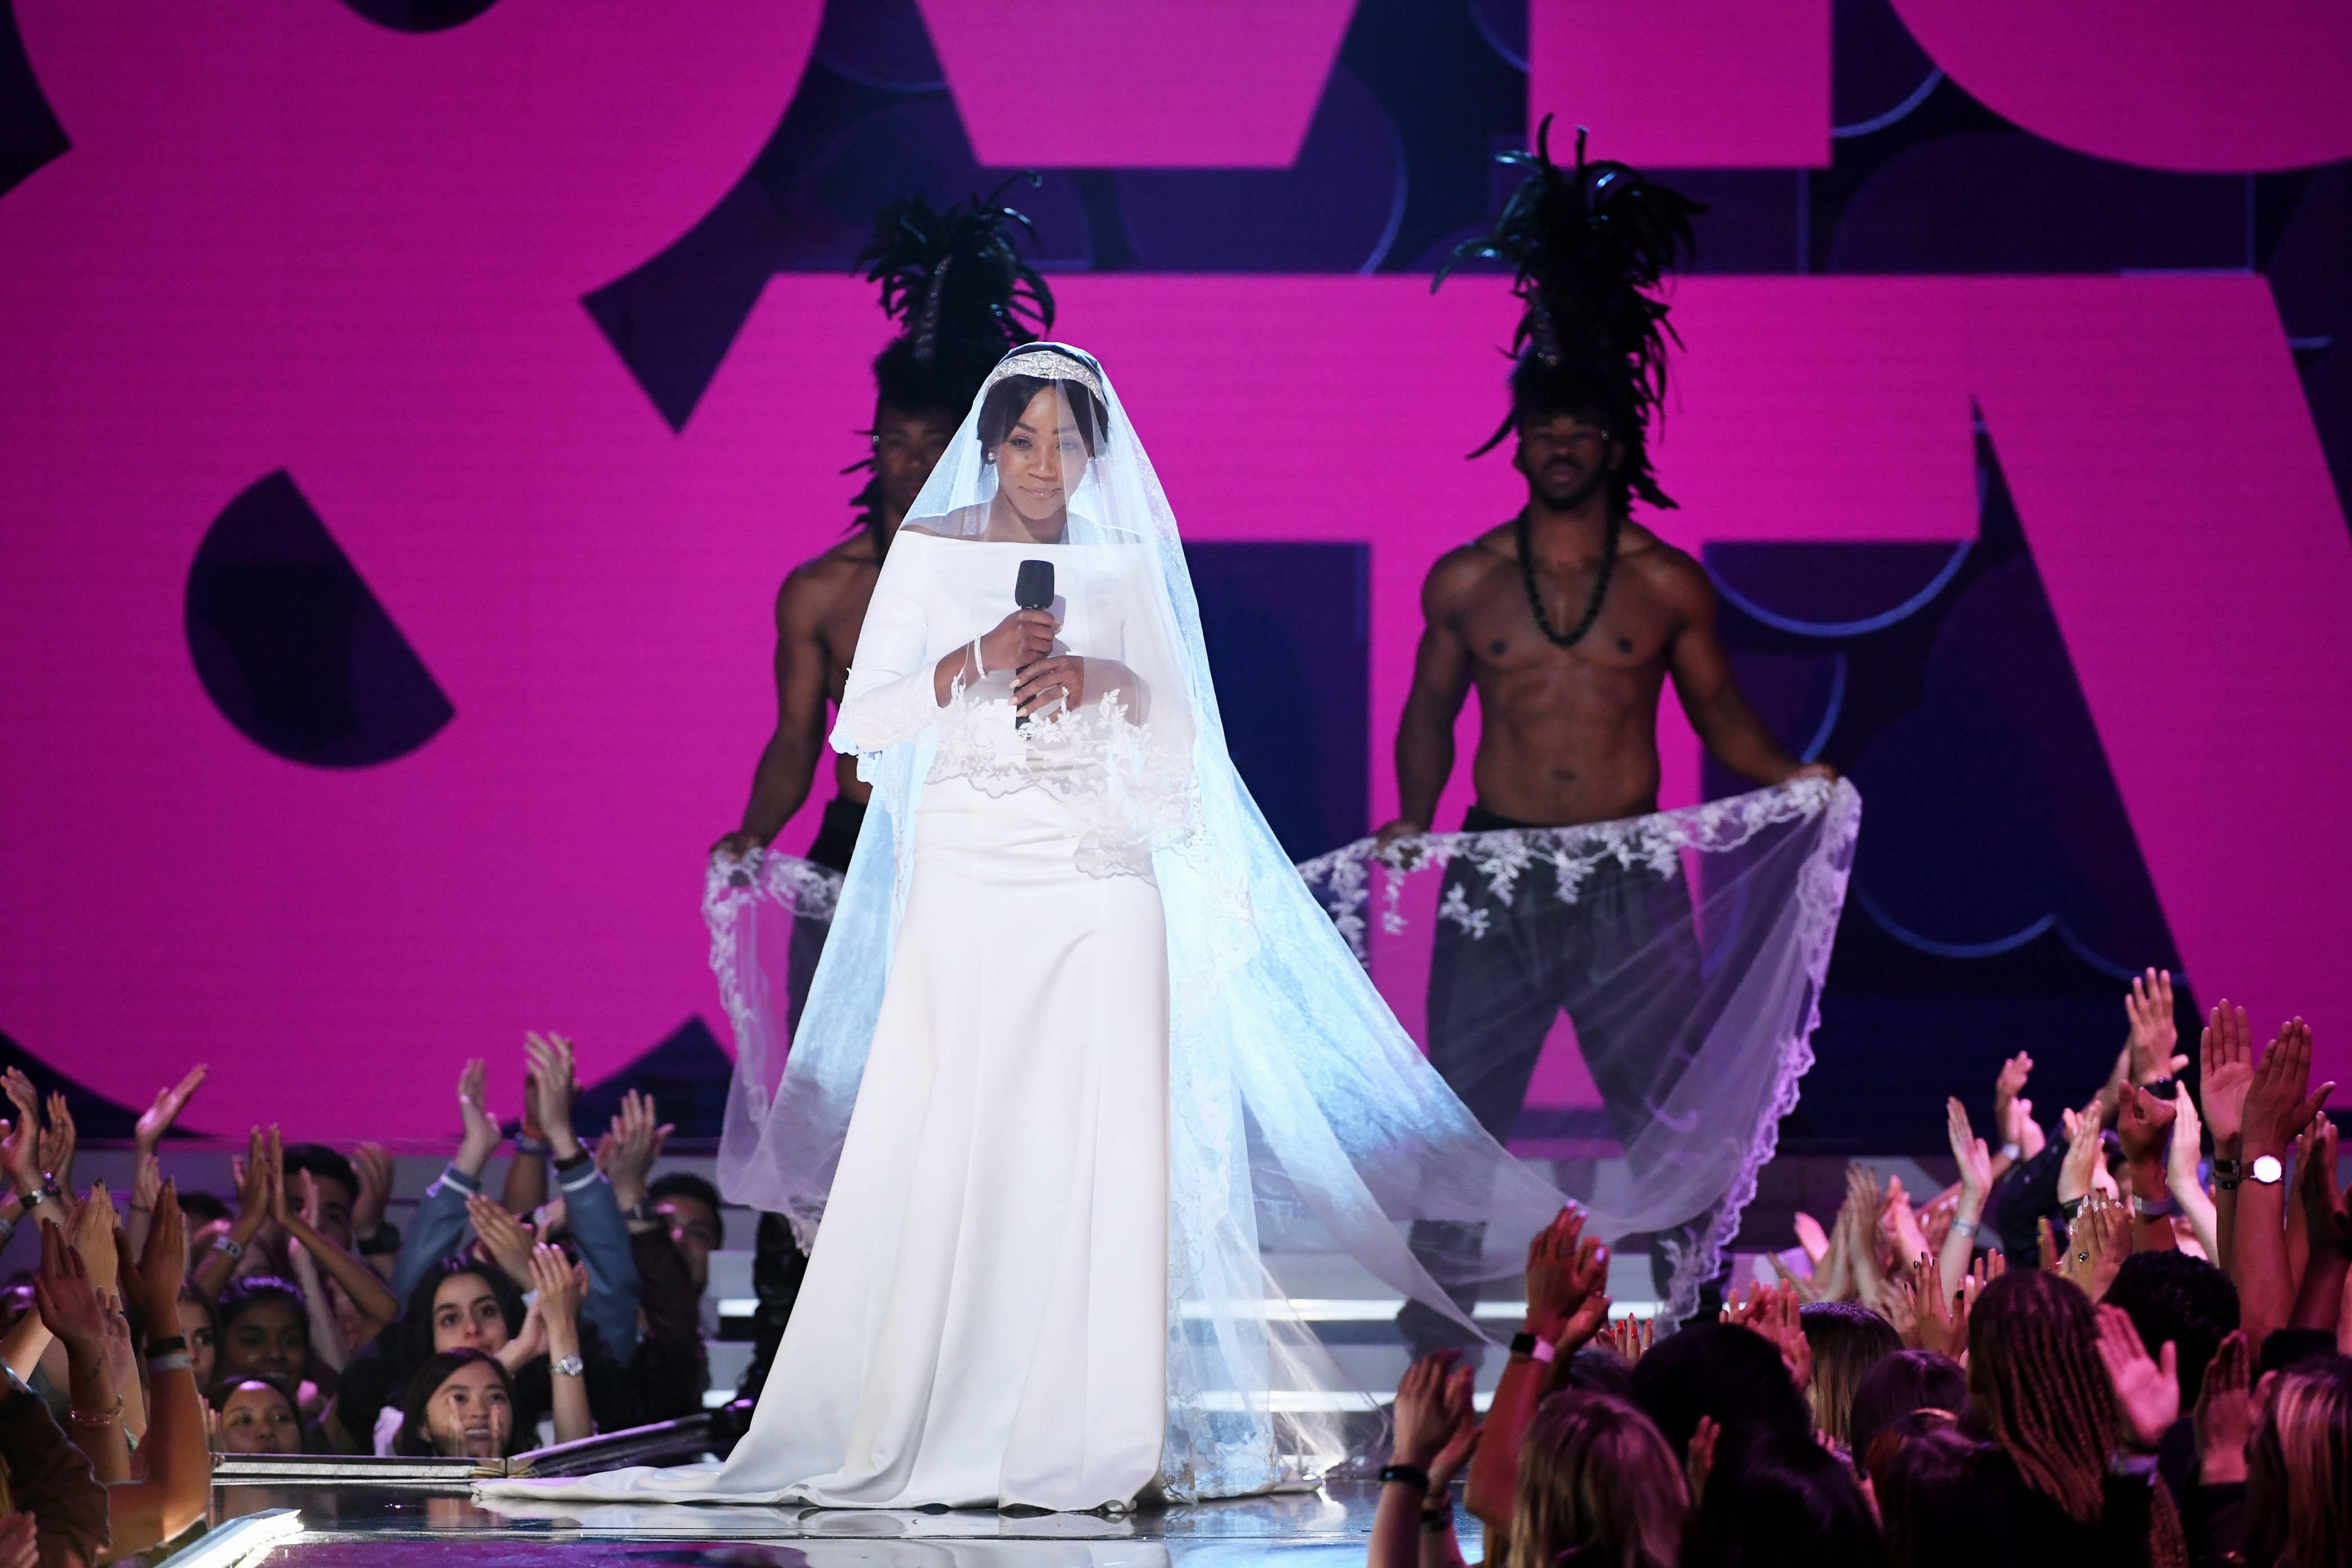 Tiffany Haddish is ready for Leonardo DiCaprio as she 'wears Meghan Markle's wedding dress' to MTV Movie & TV Awards